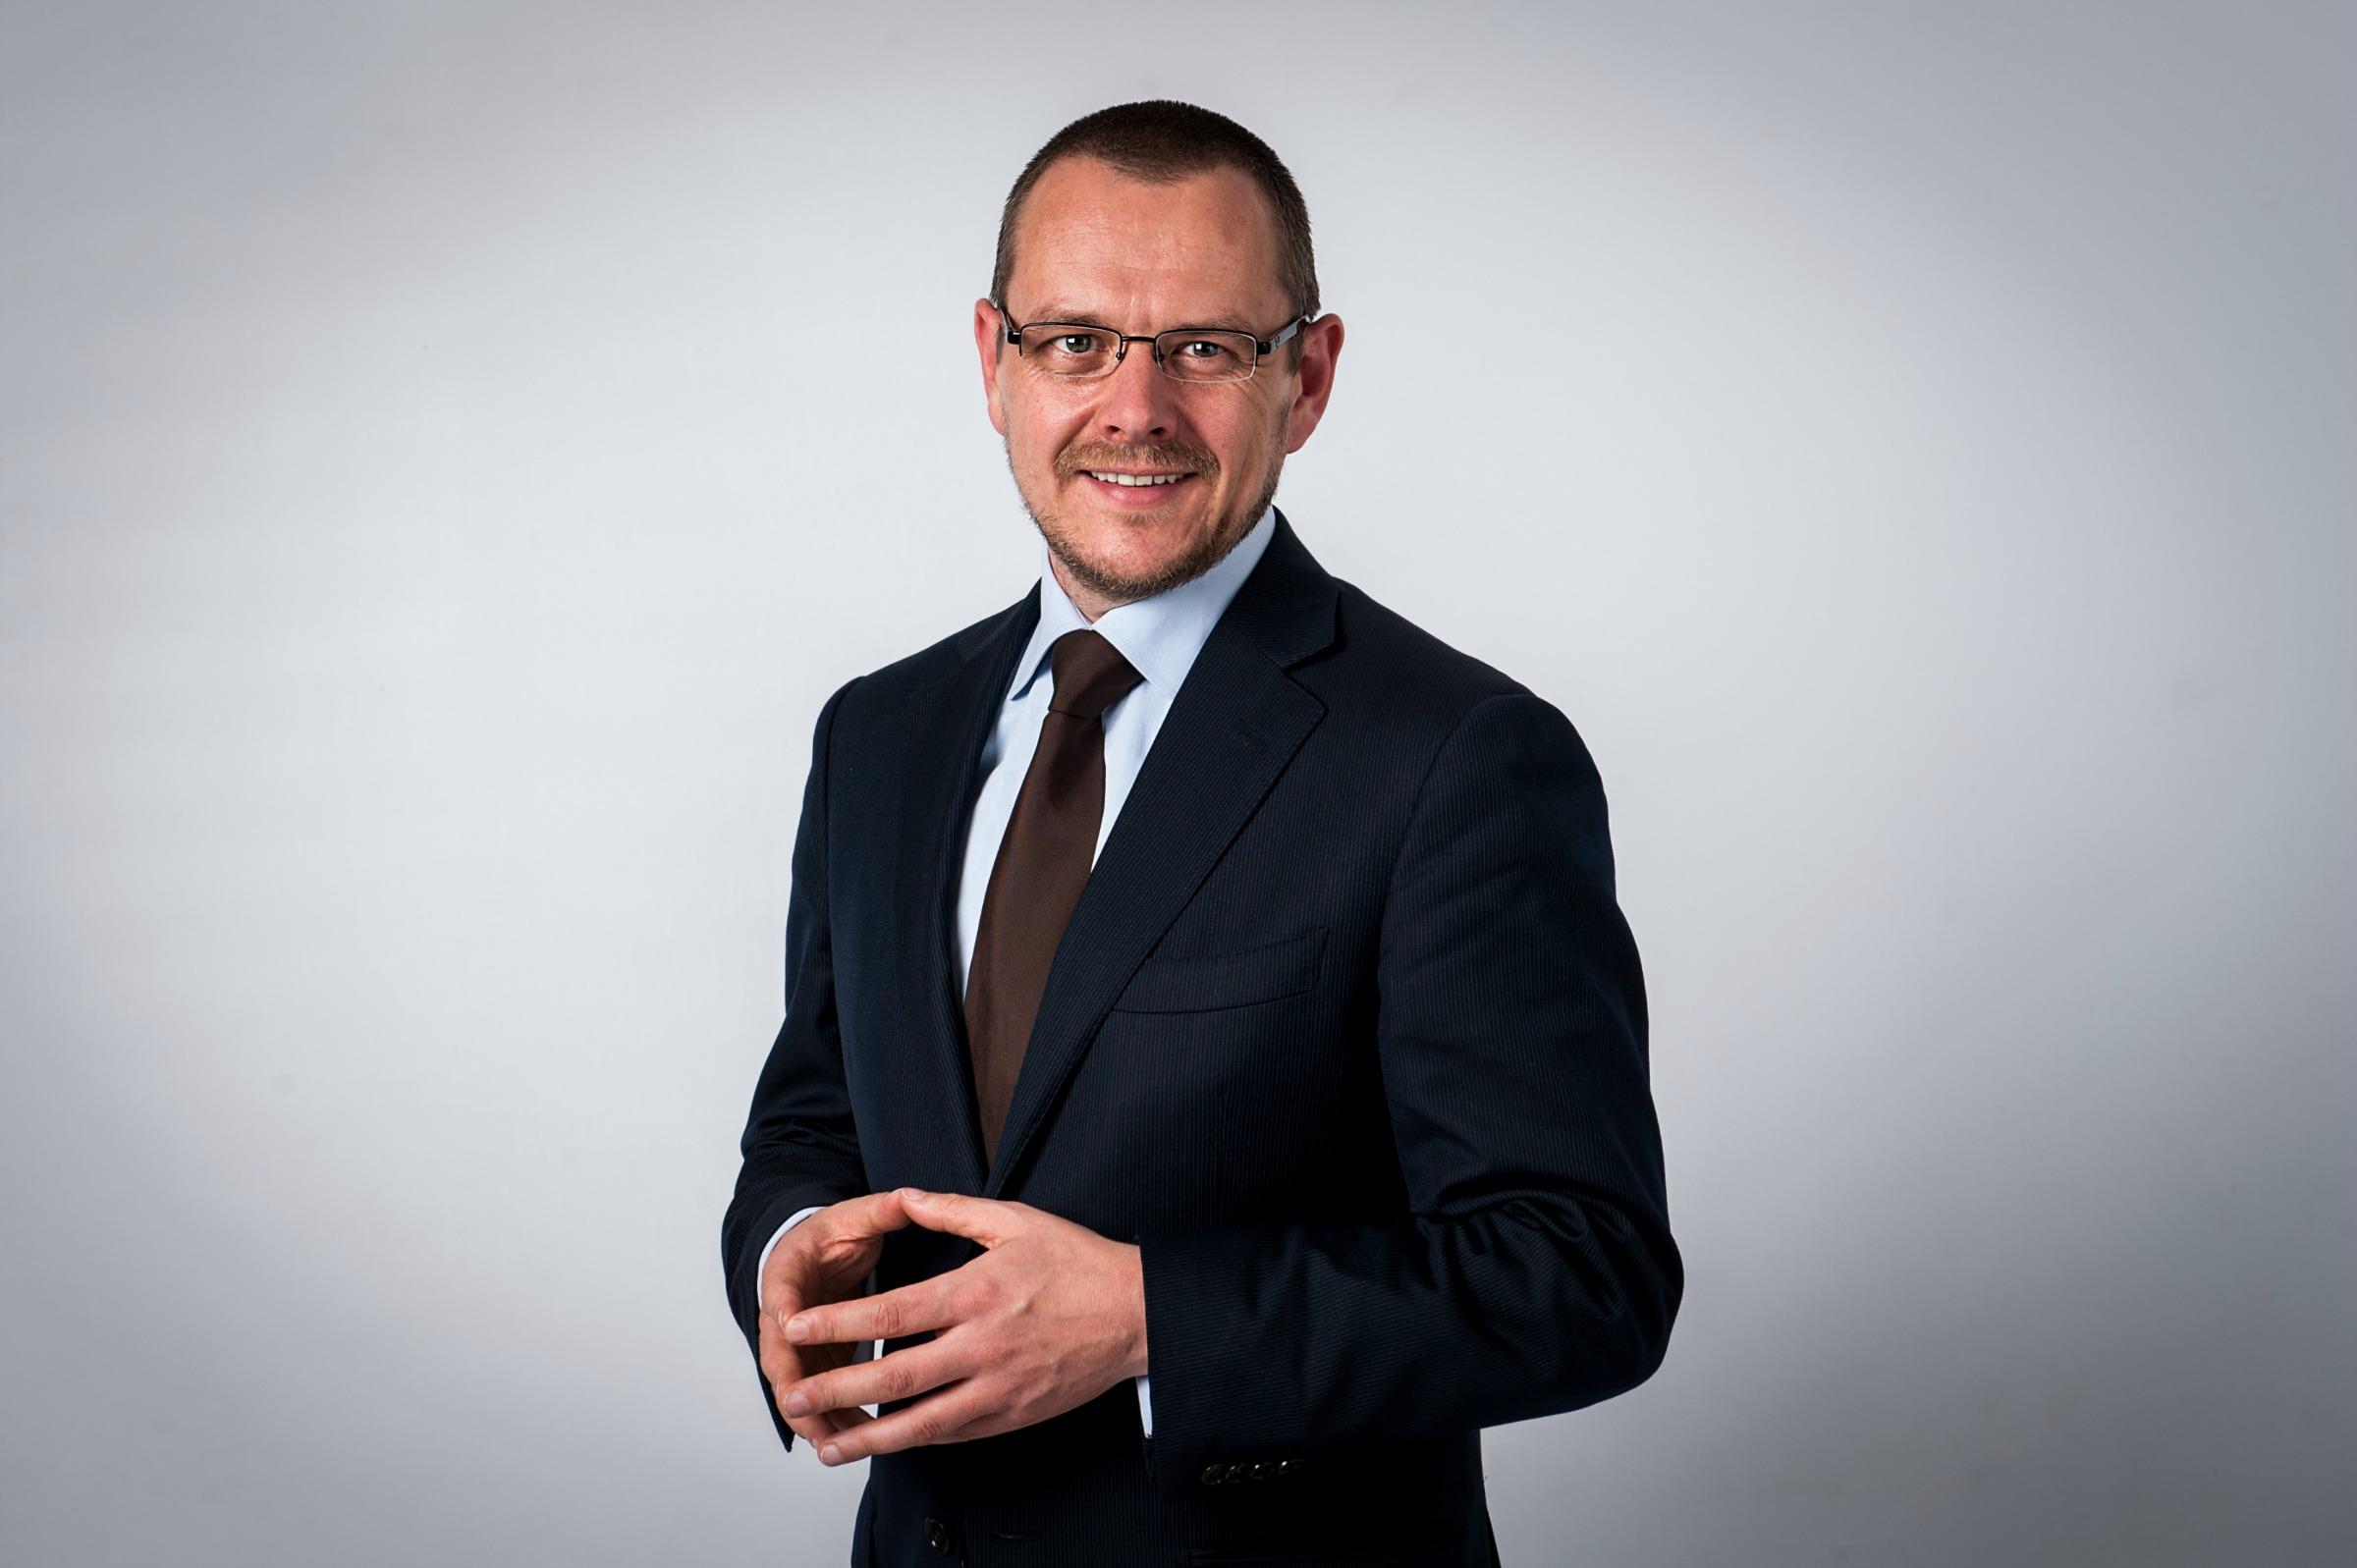 Gary Bridgeman, managing director of Hodos Consulting